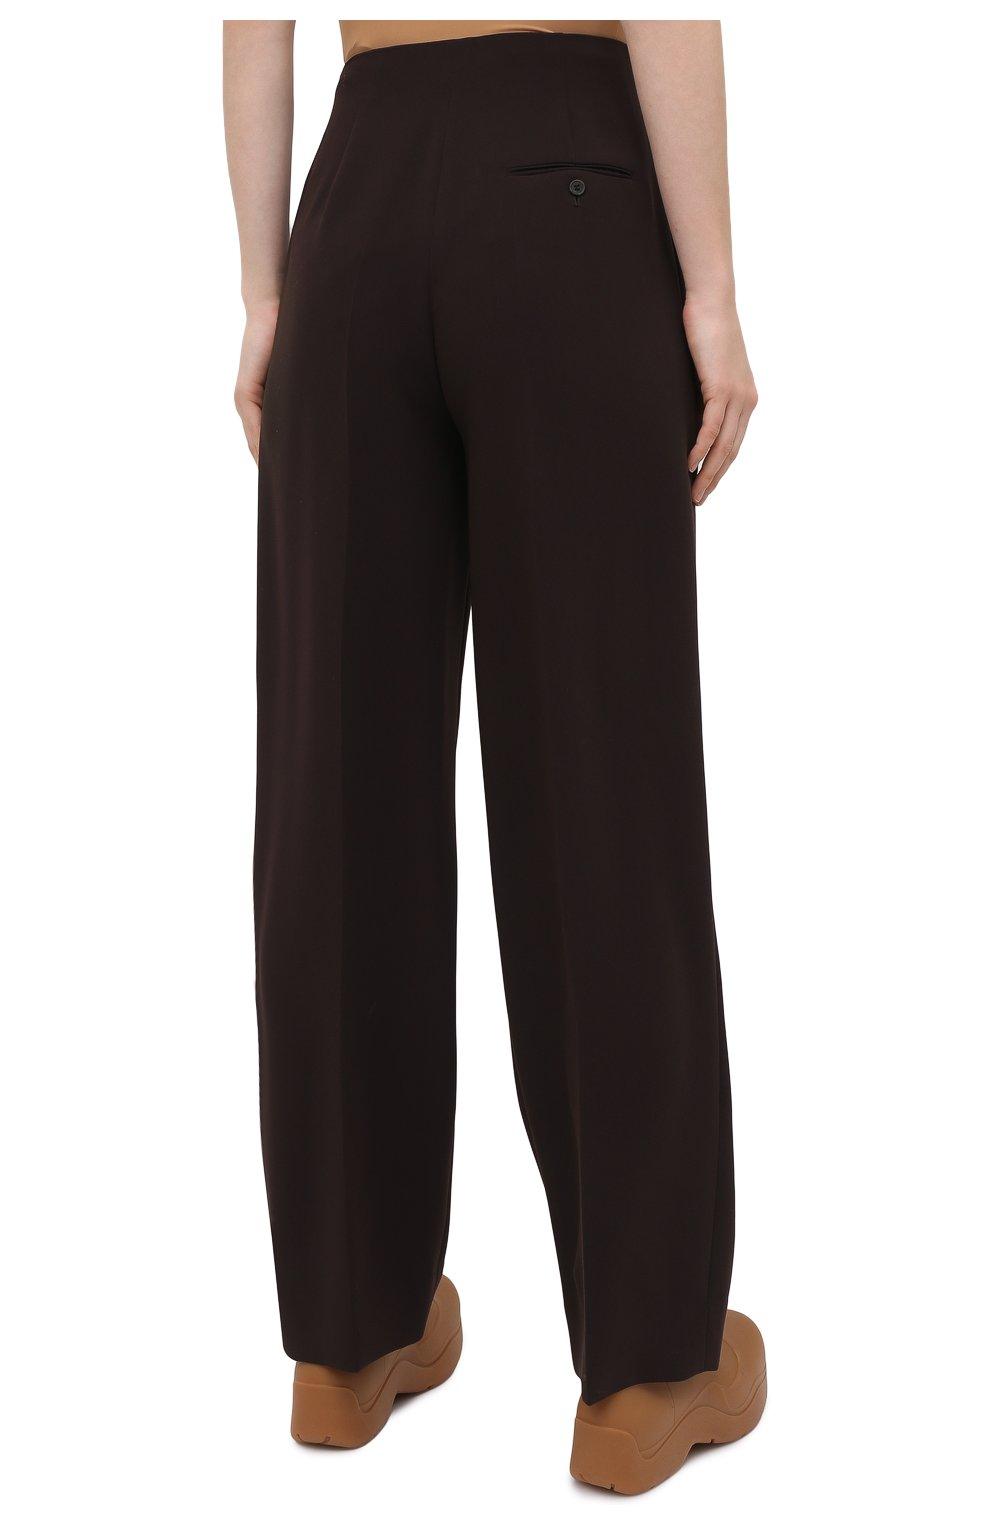 Женские брюки THE ROW темно-коричневого цвета, арт. 5475W1968   Фото 4